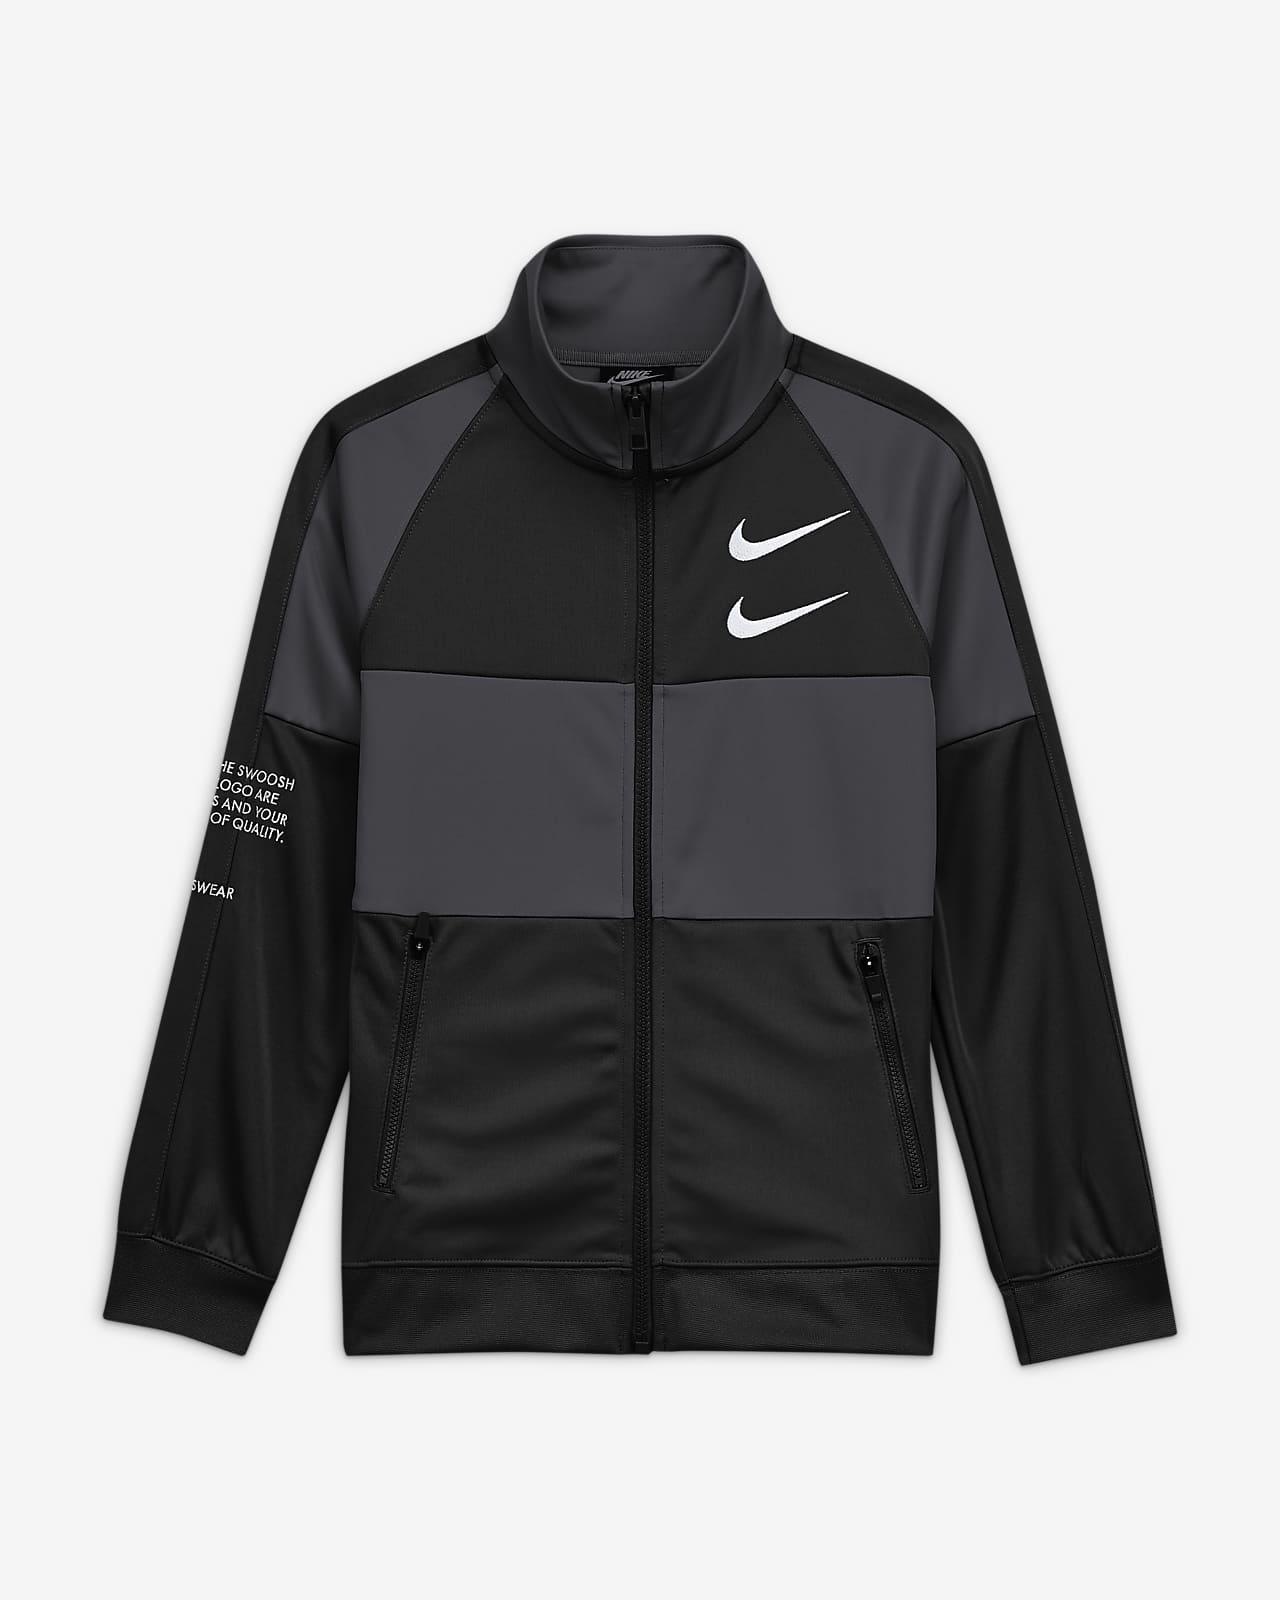 Jacka Nike Sportswear Swoosh för ungdom (killar)